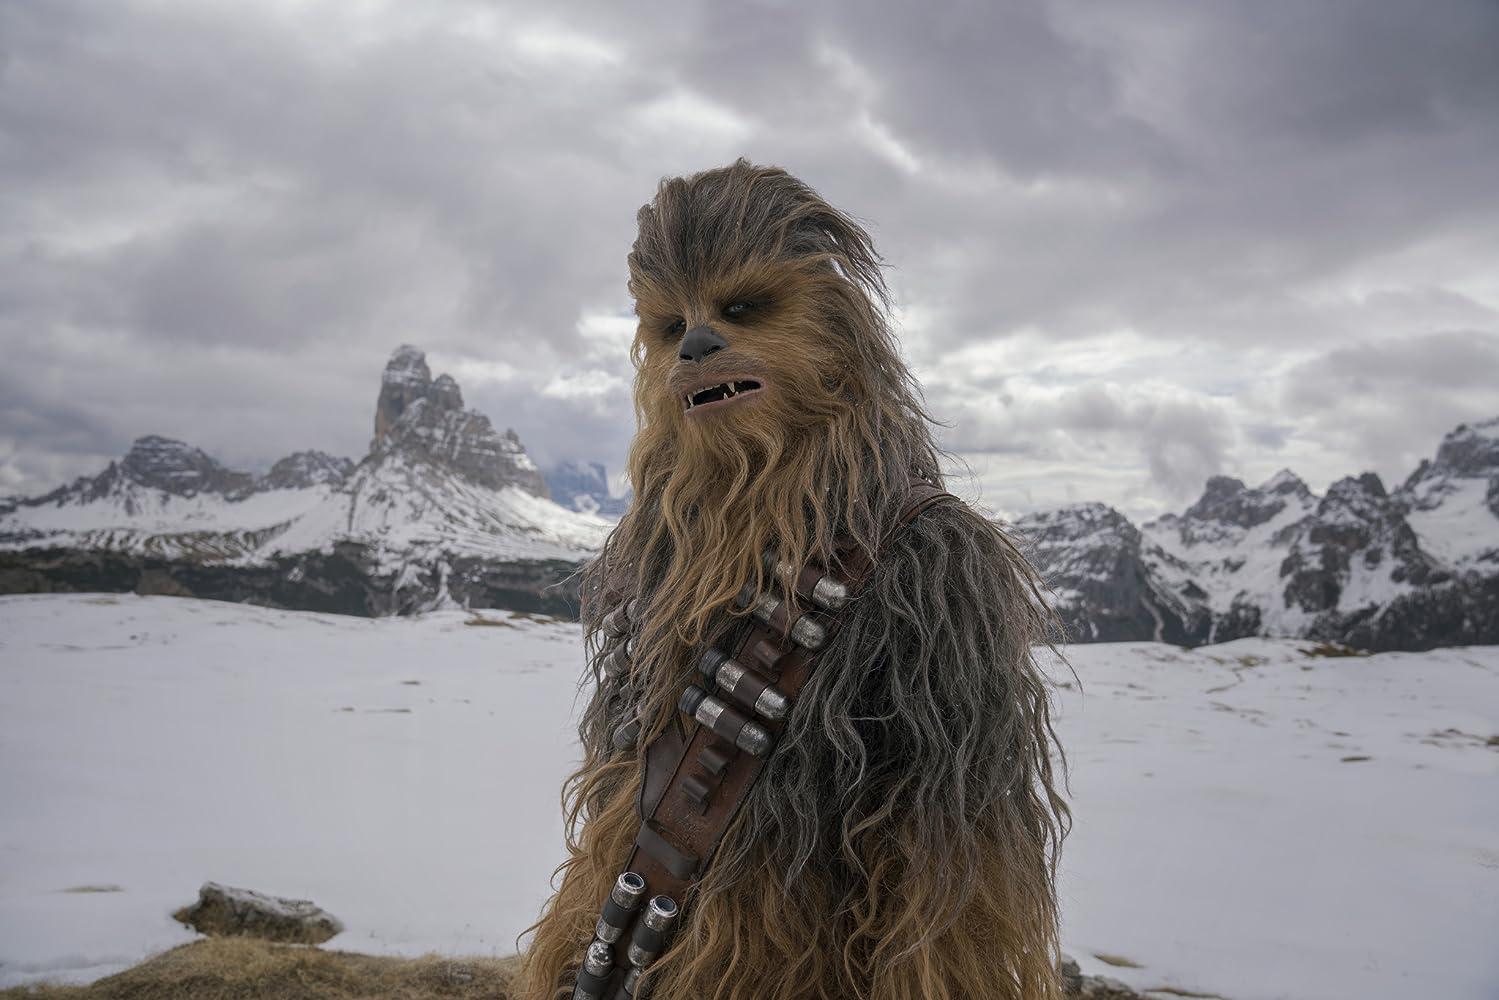 Joonas Suotamo in Solo: A Star Wars Story (2018)